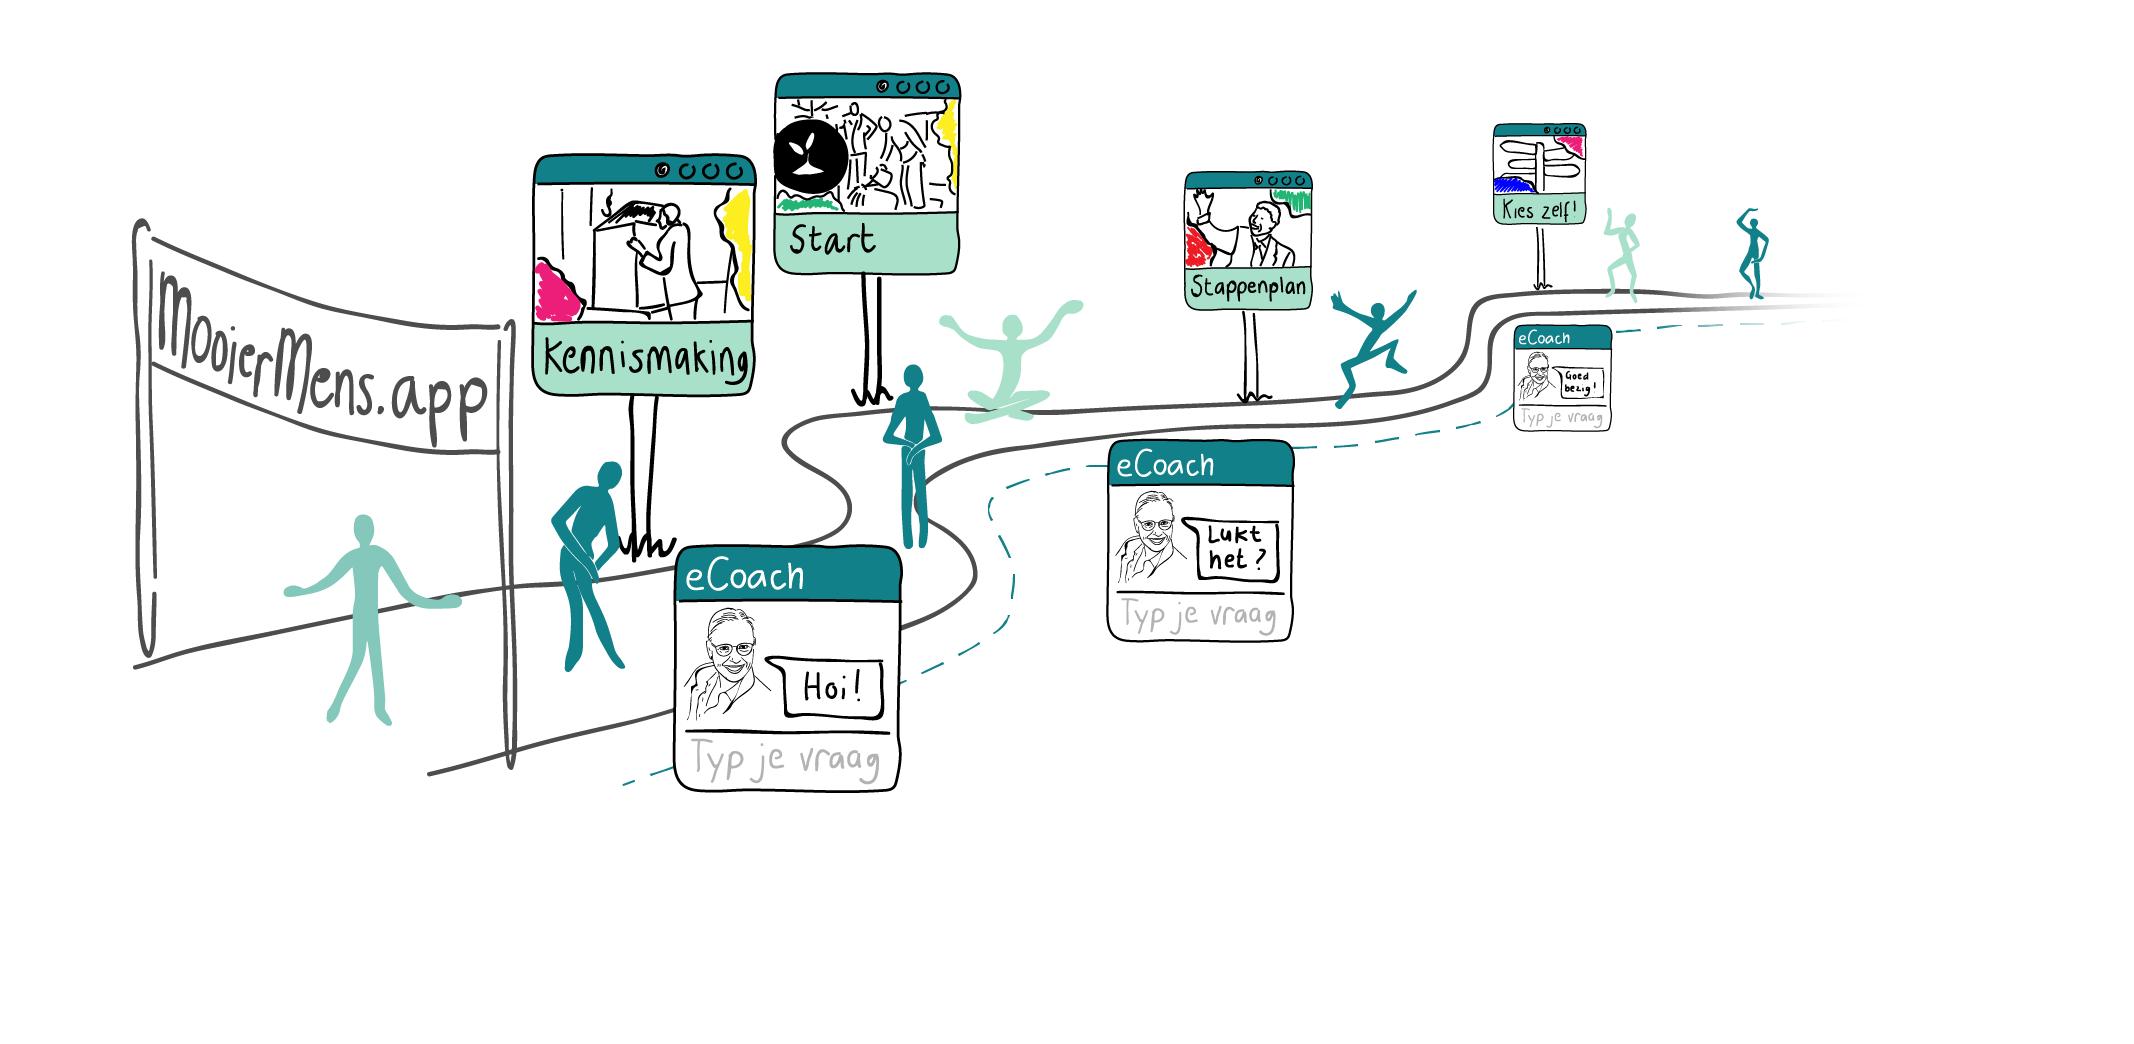 Mooiermens.app infographic